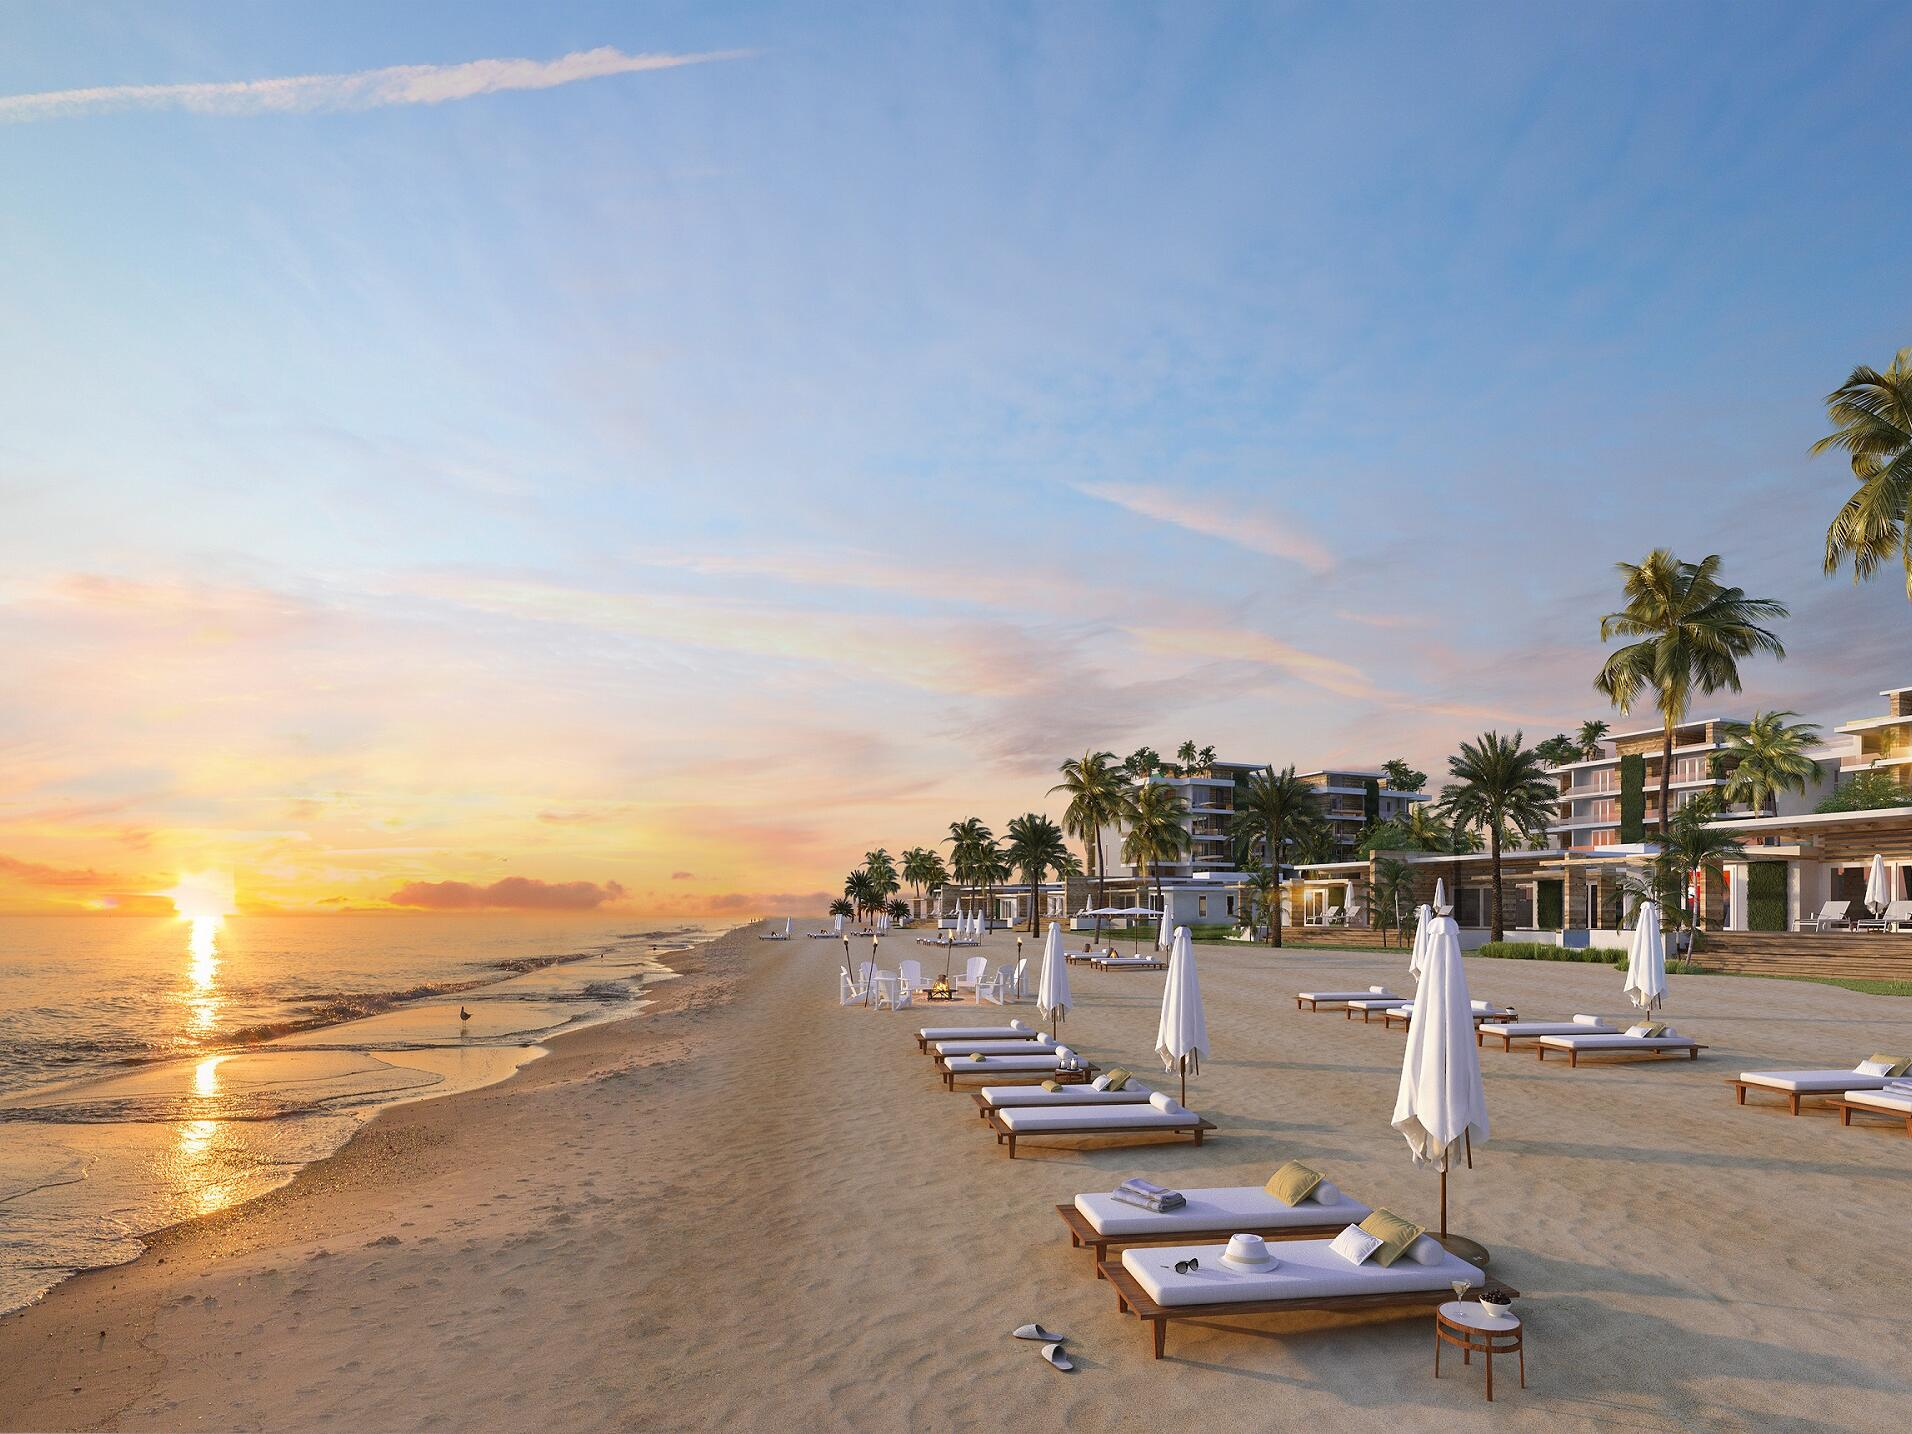 Mar de Tumbo Beach